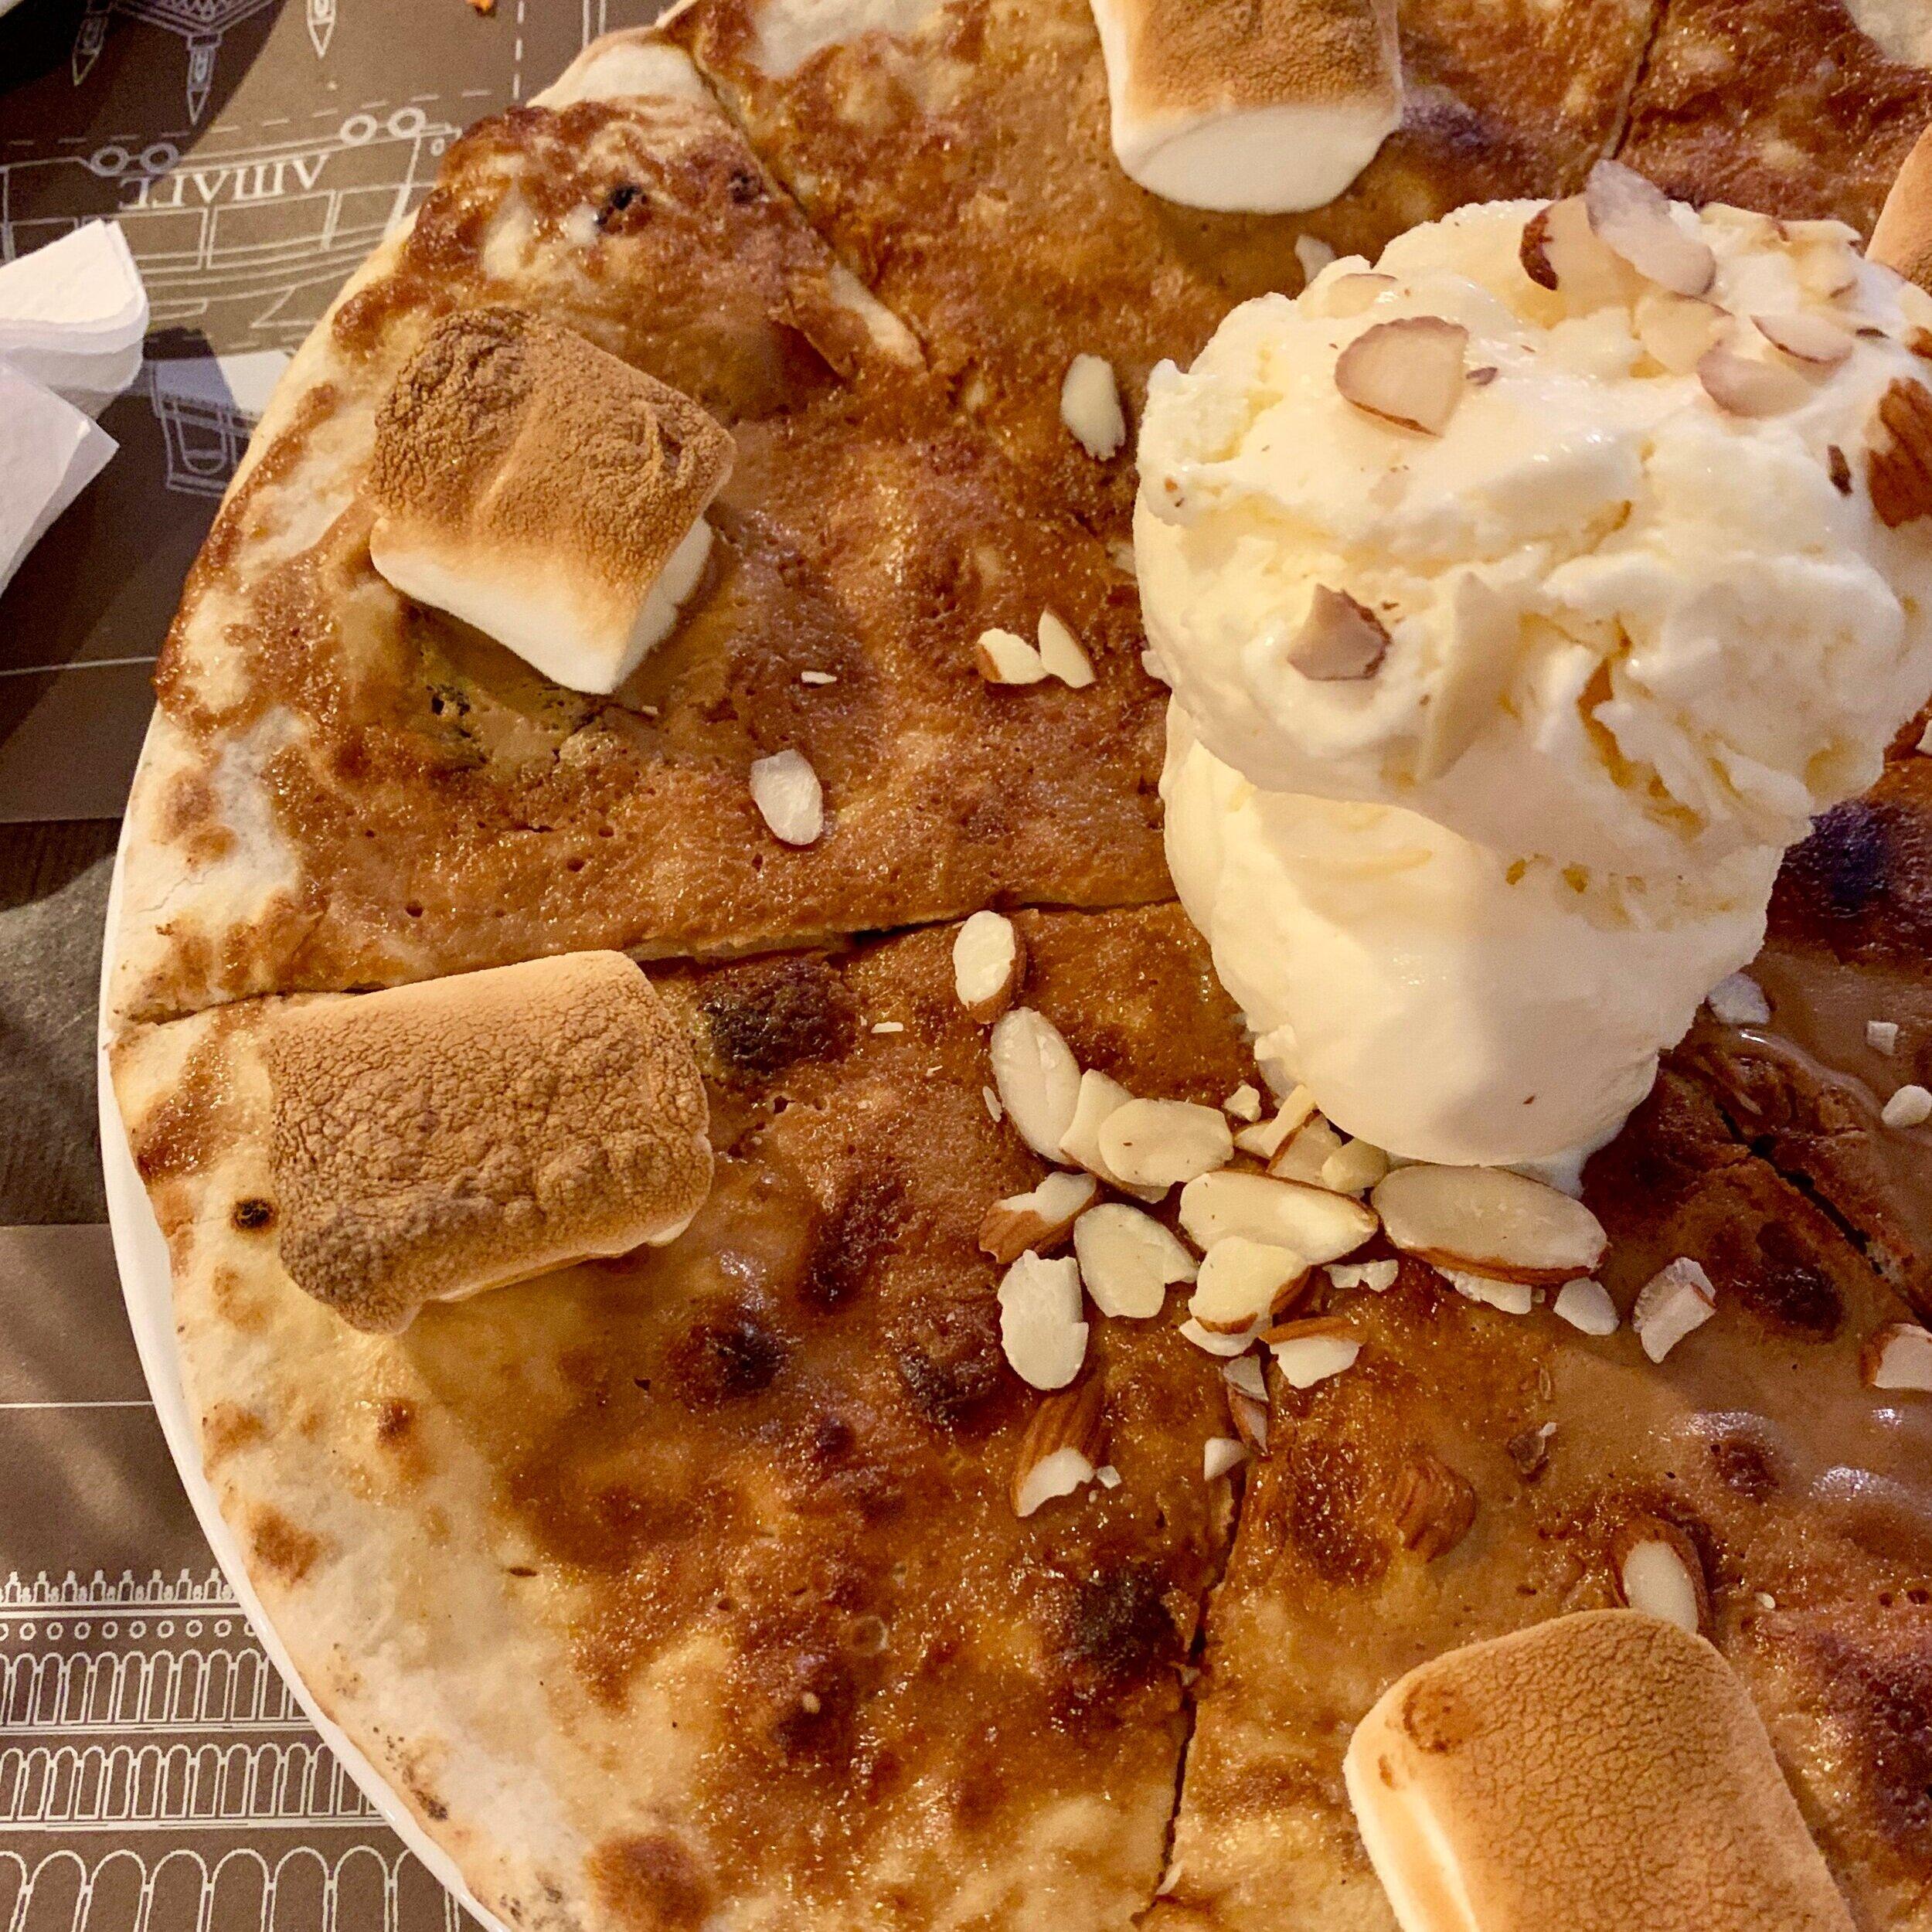 - Nobody tell my kids we got dessert pizza without them. Selemet!